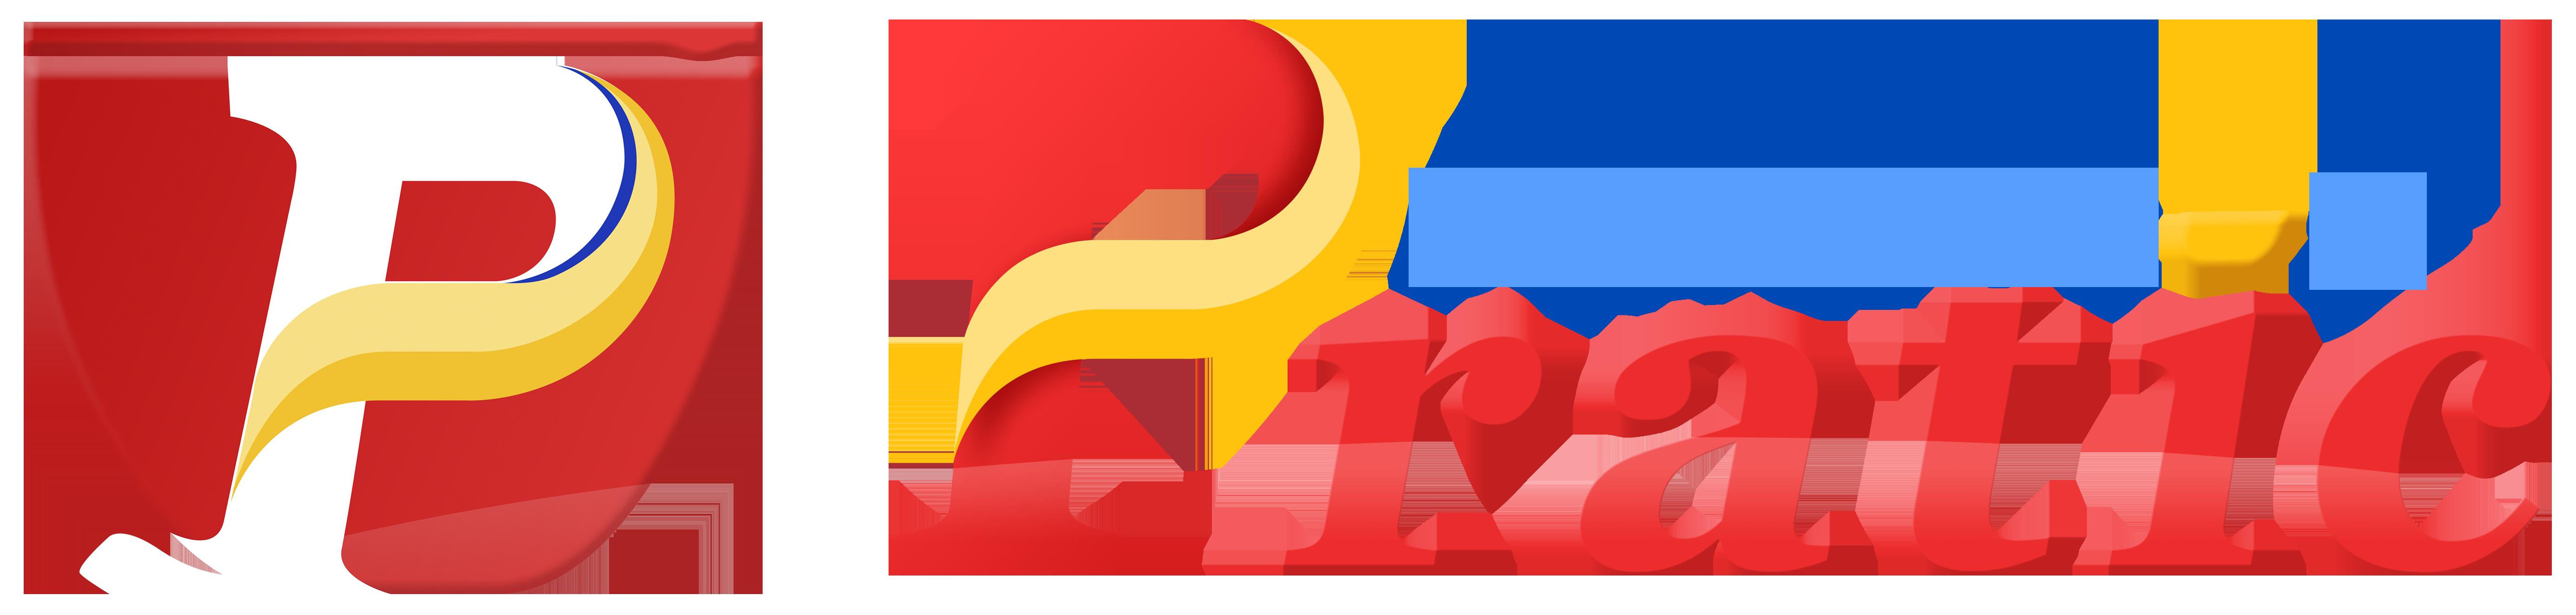 Pratic-Plásticos-ultilidades domésticas-potes-